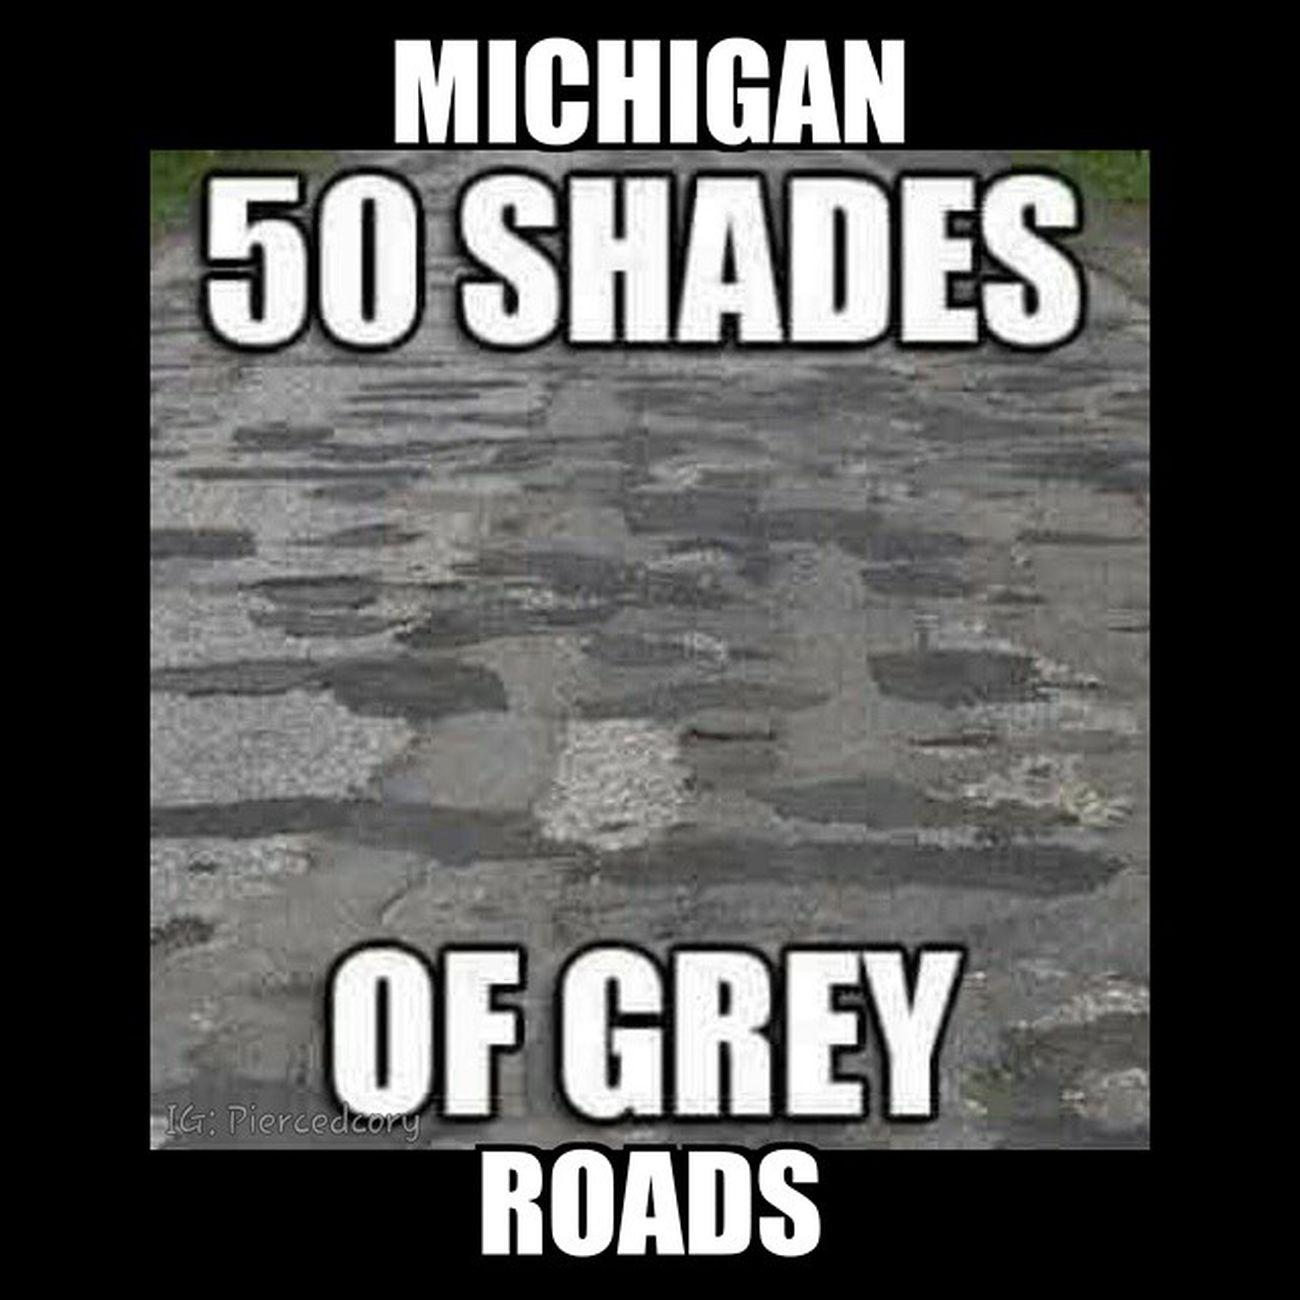 Fiftyshades 50shades Puremitten Puremichigan Michigandergr Michigan Potholes